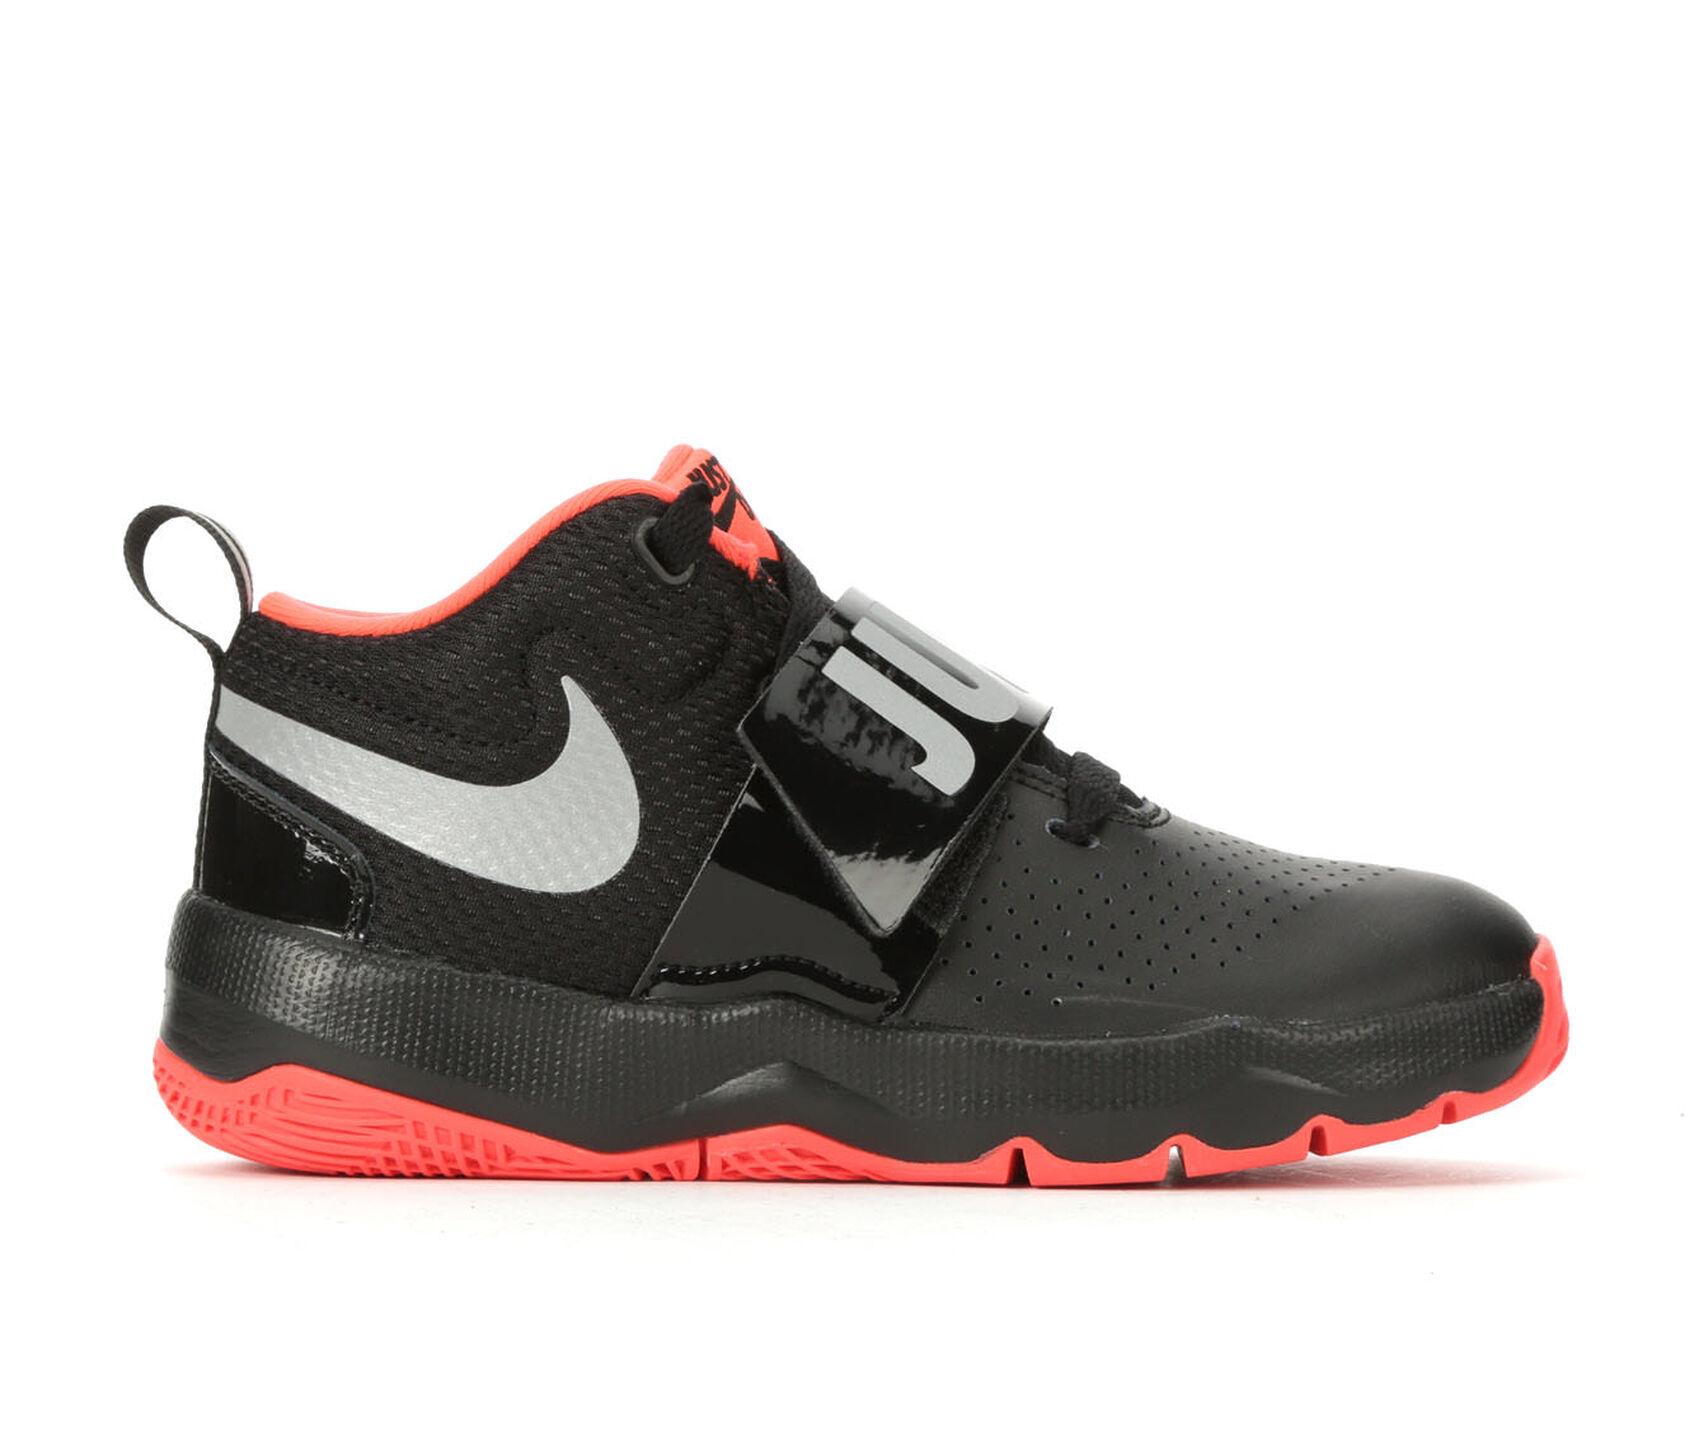 575e0d2664 Boys' Nike Little Kid Team Hustle D8 JDI High Top Basketball Shoes